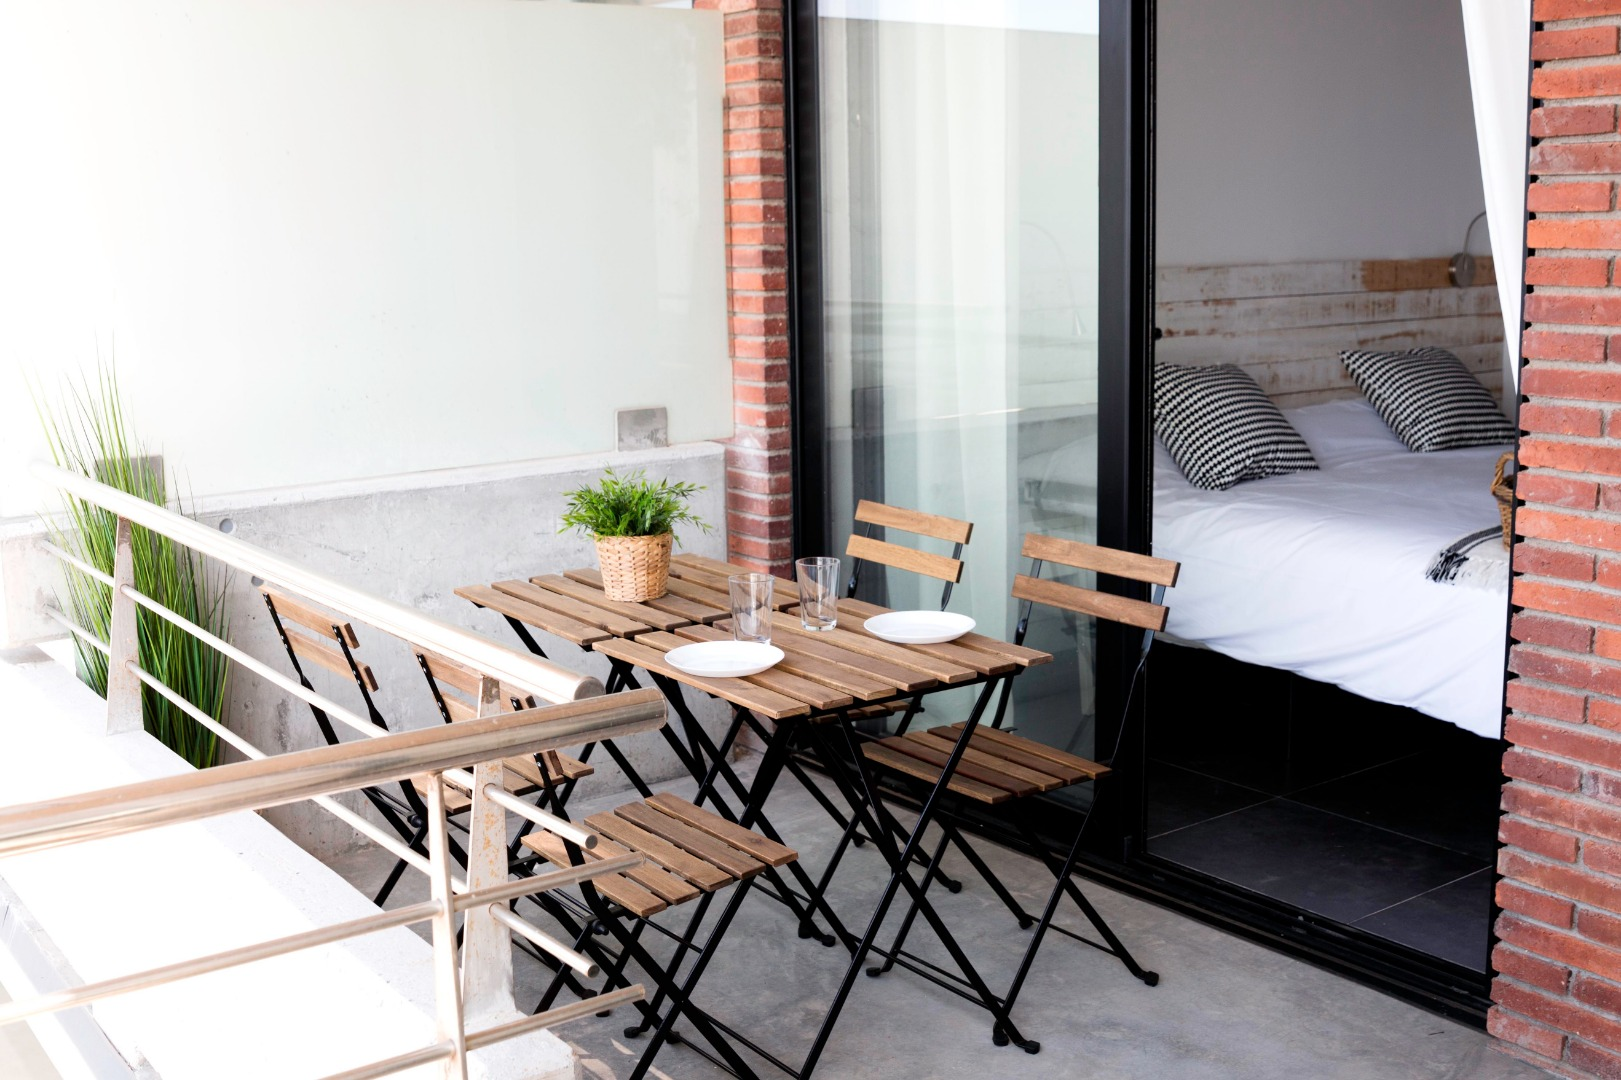 Miete Etagenwohnung  Sant andreu de llavaneres, zona de - caldes d'estrac. Realizamos alquiler de temporada anual renovable apartamentos c